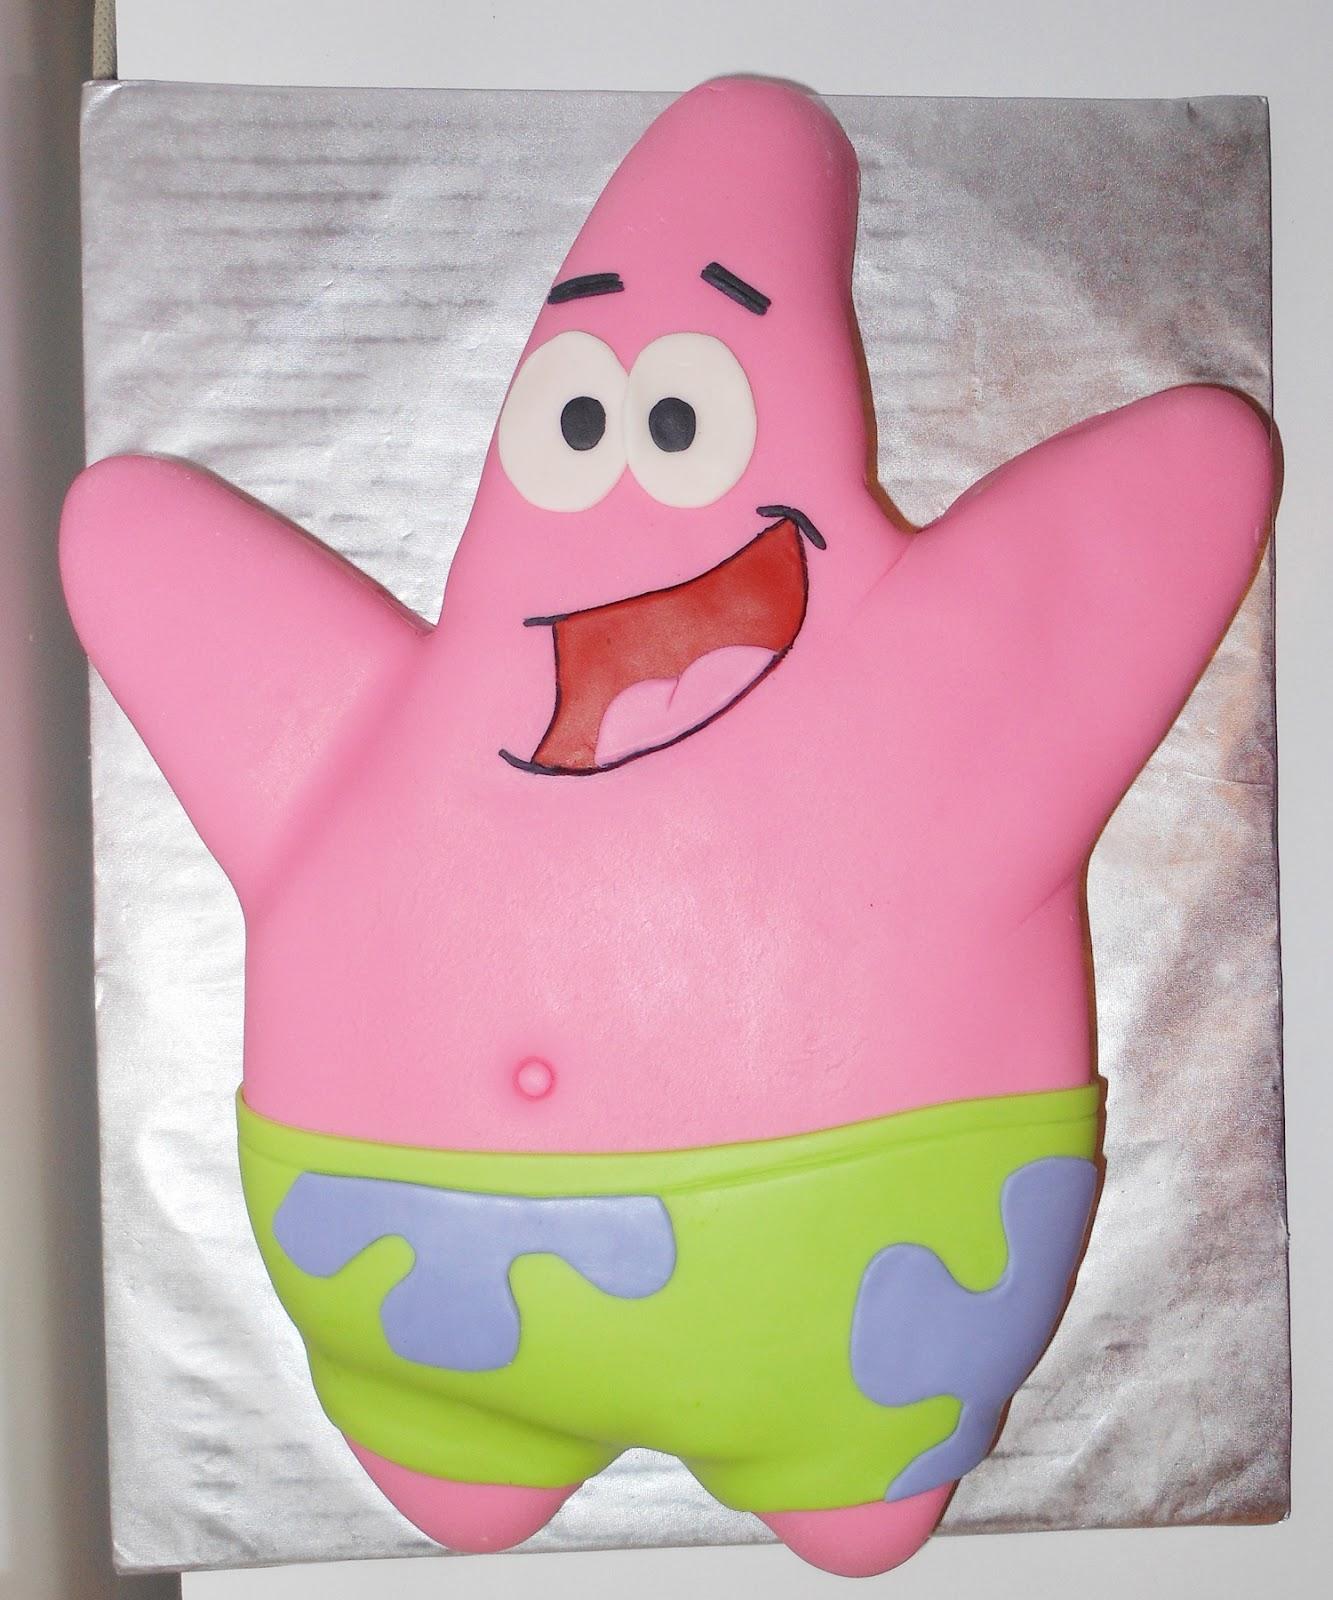 Carla's Cakes: Spongebob and Patrick